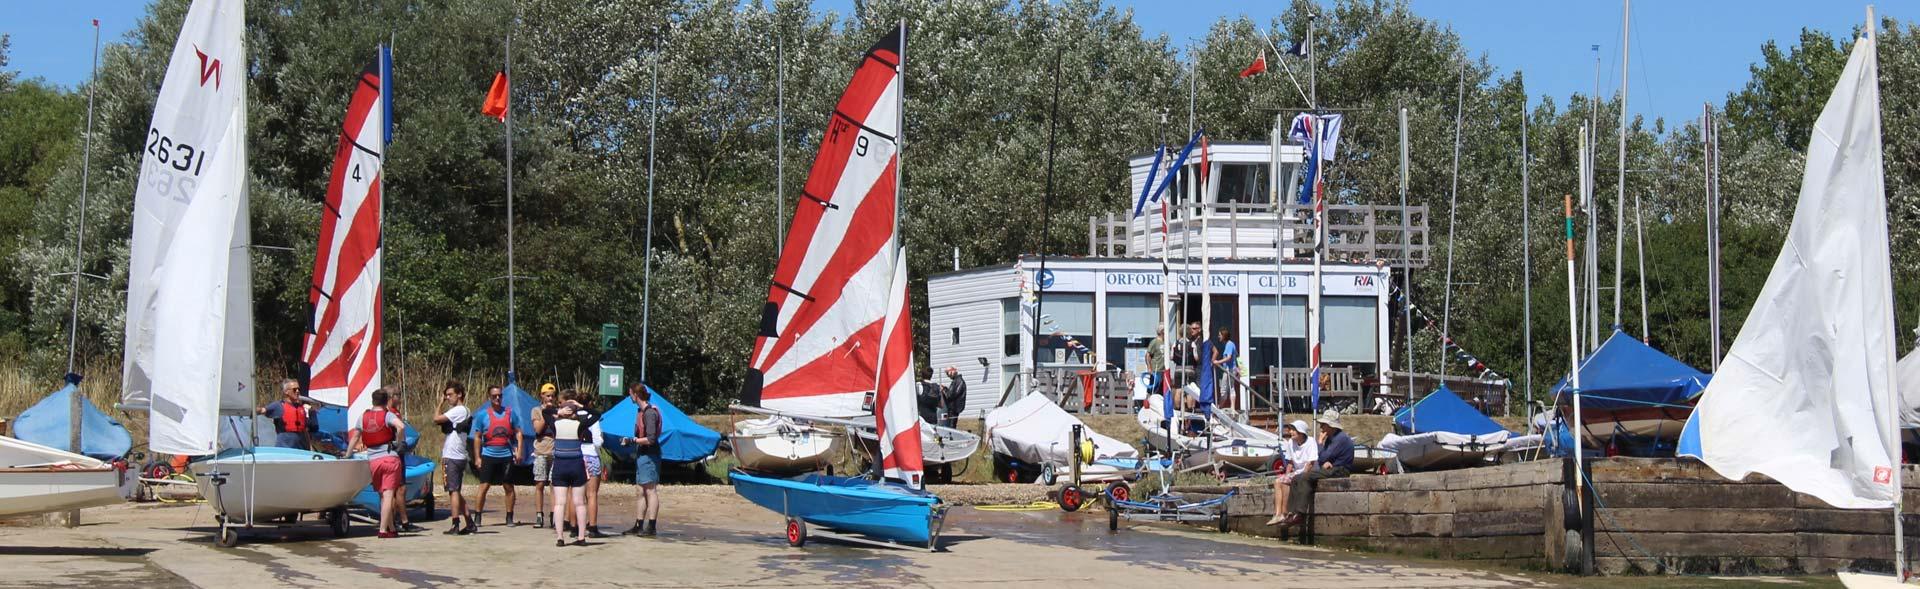 Orford Sailing Club Training